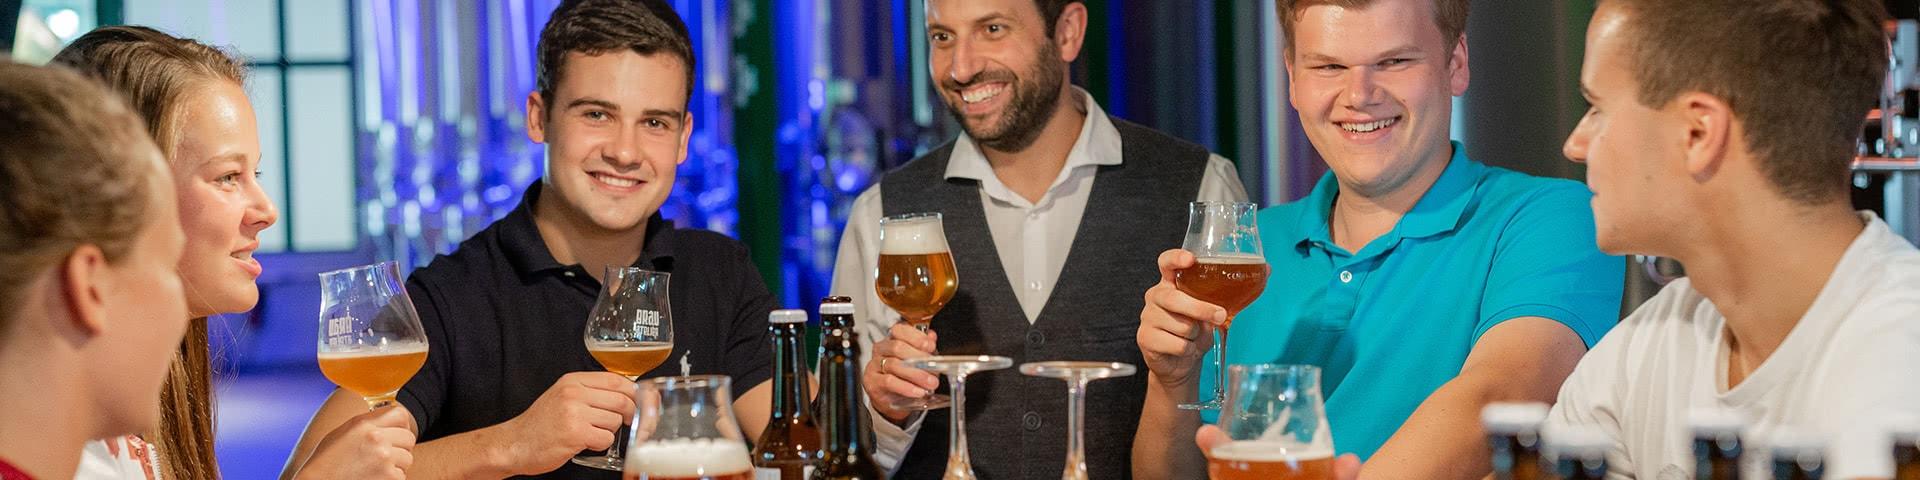 Bierverkostung in der Potts Brauerei